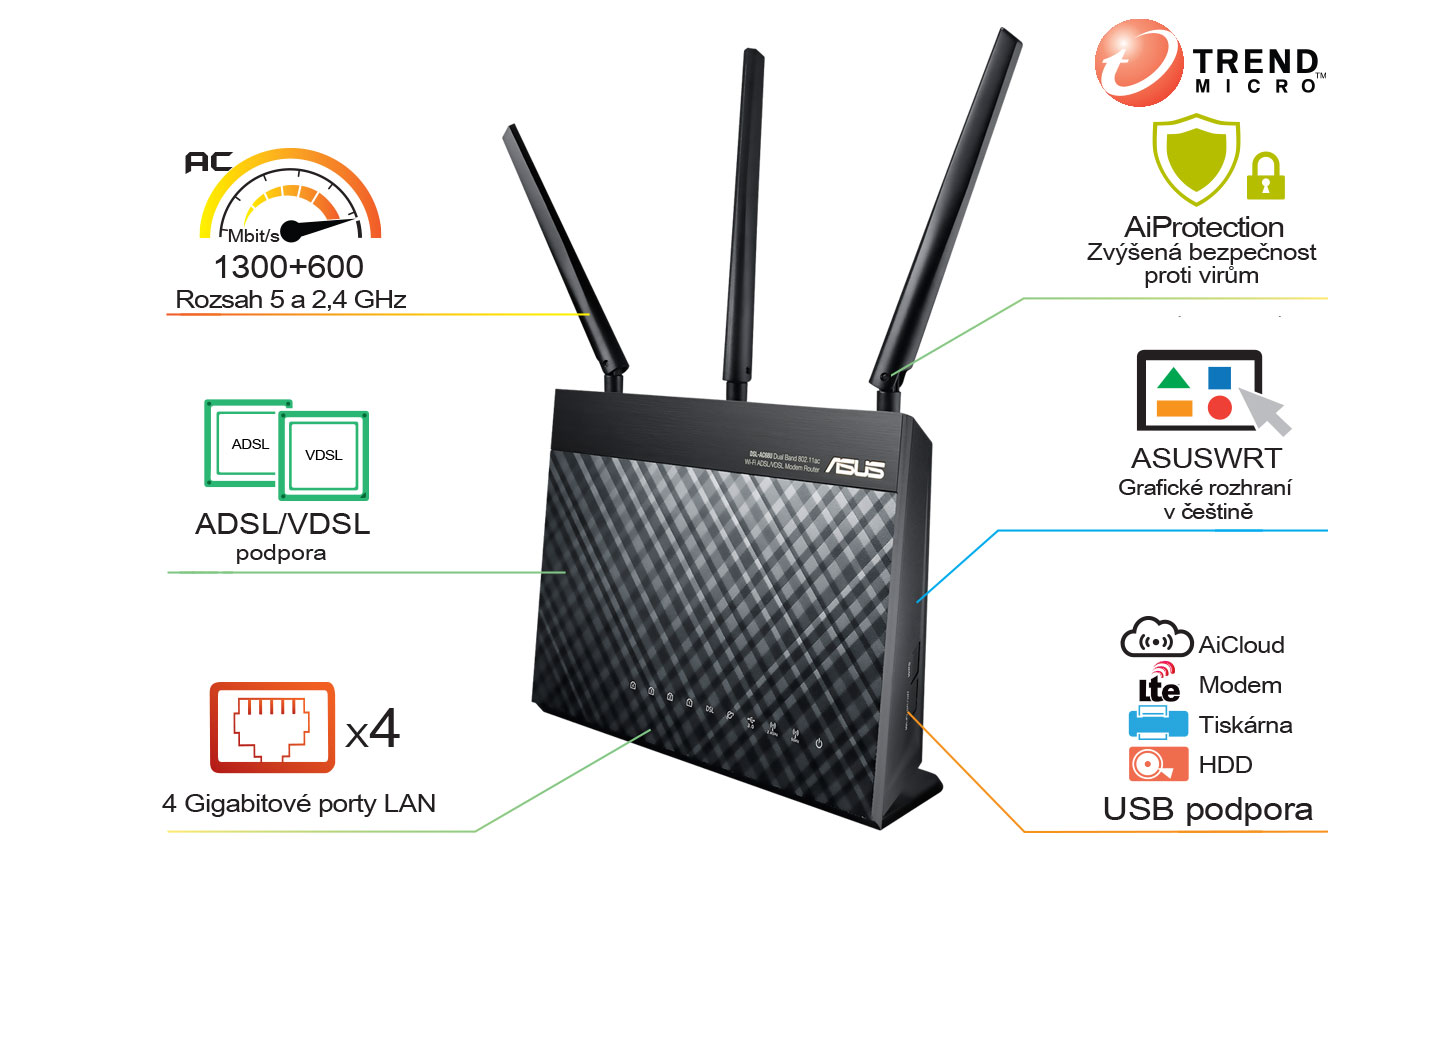 ASUS DSL-AC68U Dual-band Wireless AC1900 VDSL/ADSL Modem Router, 4x gigabit RJ45, 1x USB3.0